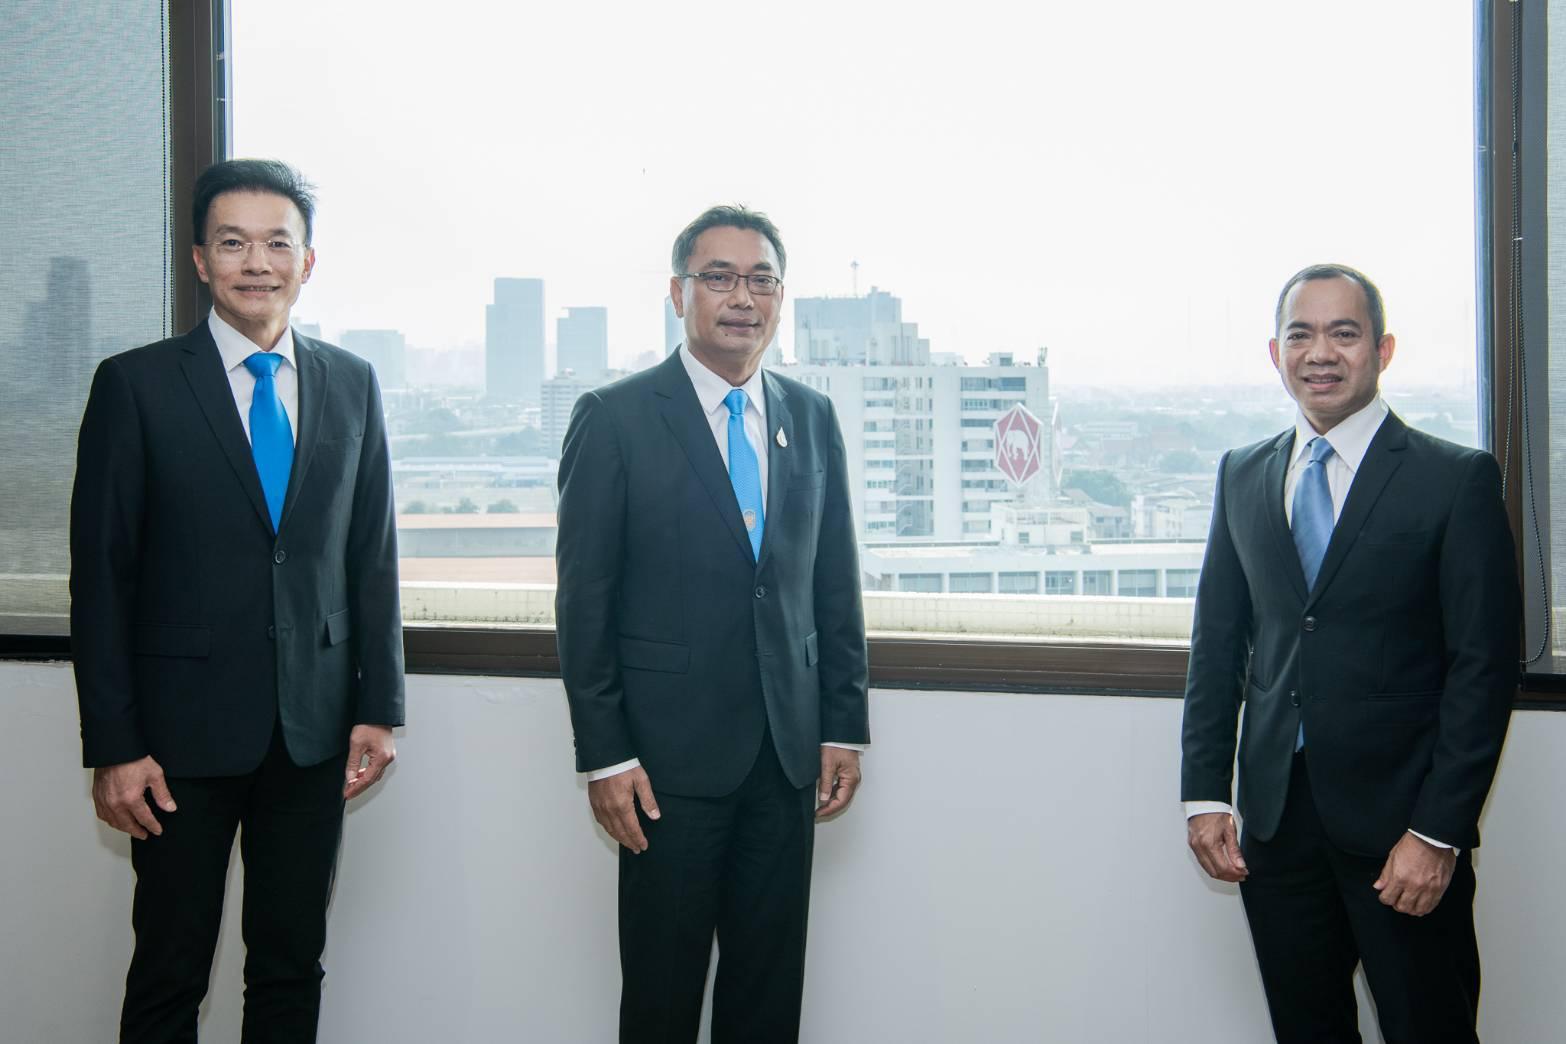 SCG ร่วมมือ สภาวิศวกร ยกระดับมาตรฐานวิศวกรไทย ก้าวไปสู่สากล